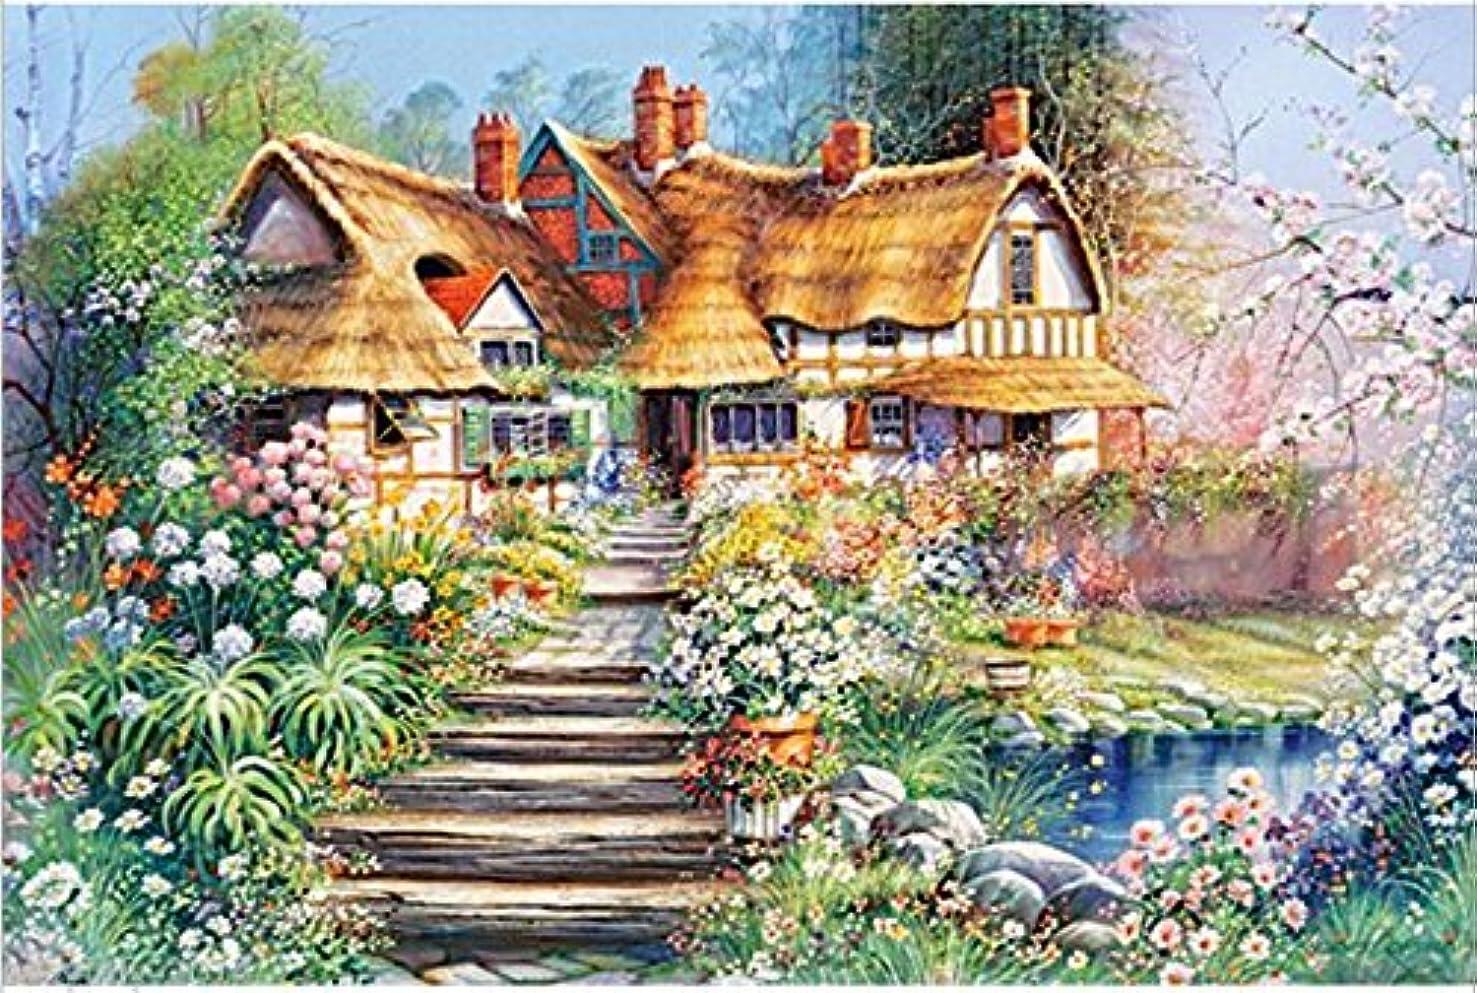 45x30cm Country House Diamond Embroidery Diamond DIY Painting Cross Stitch